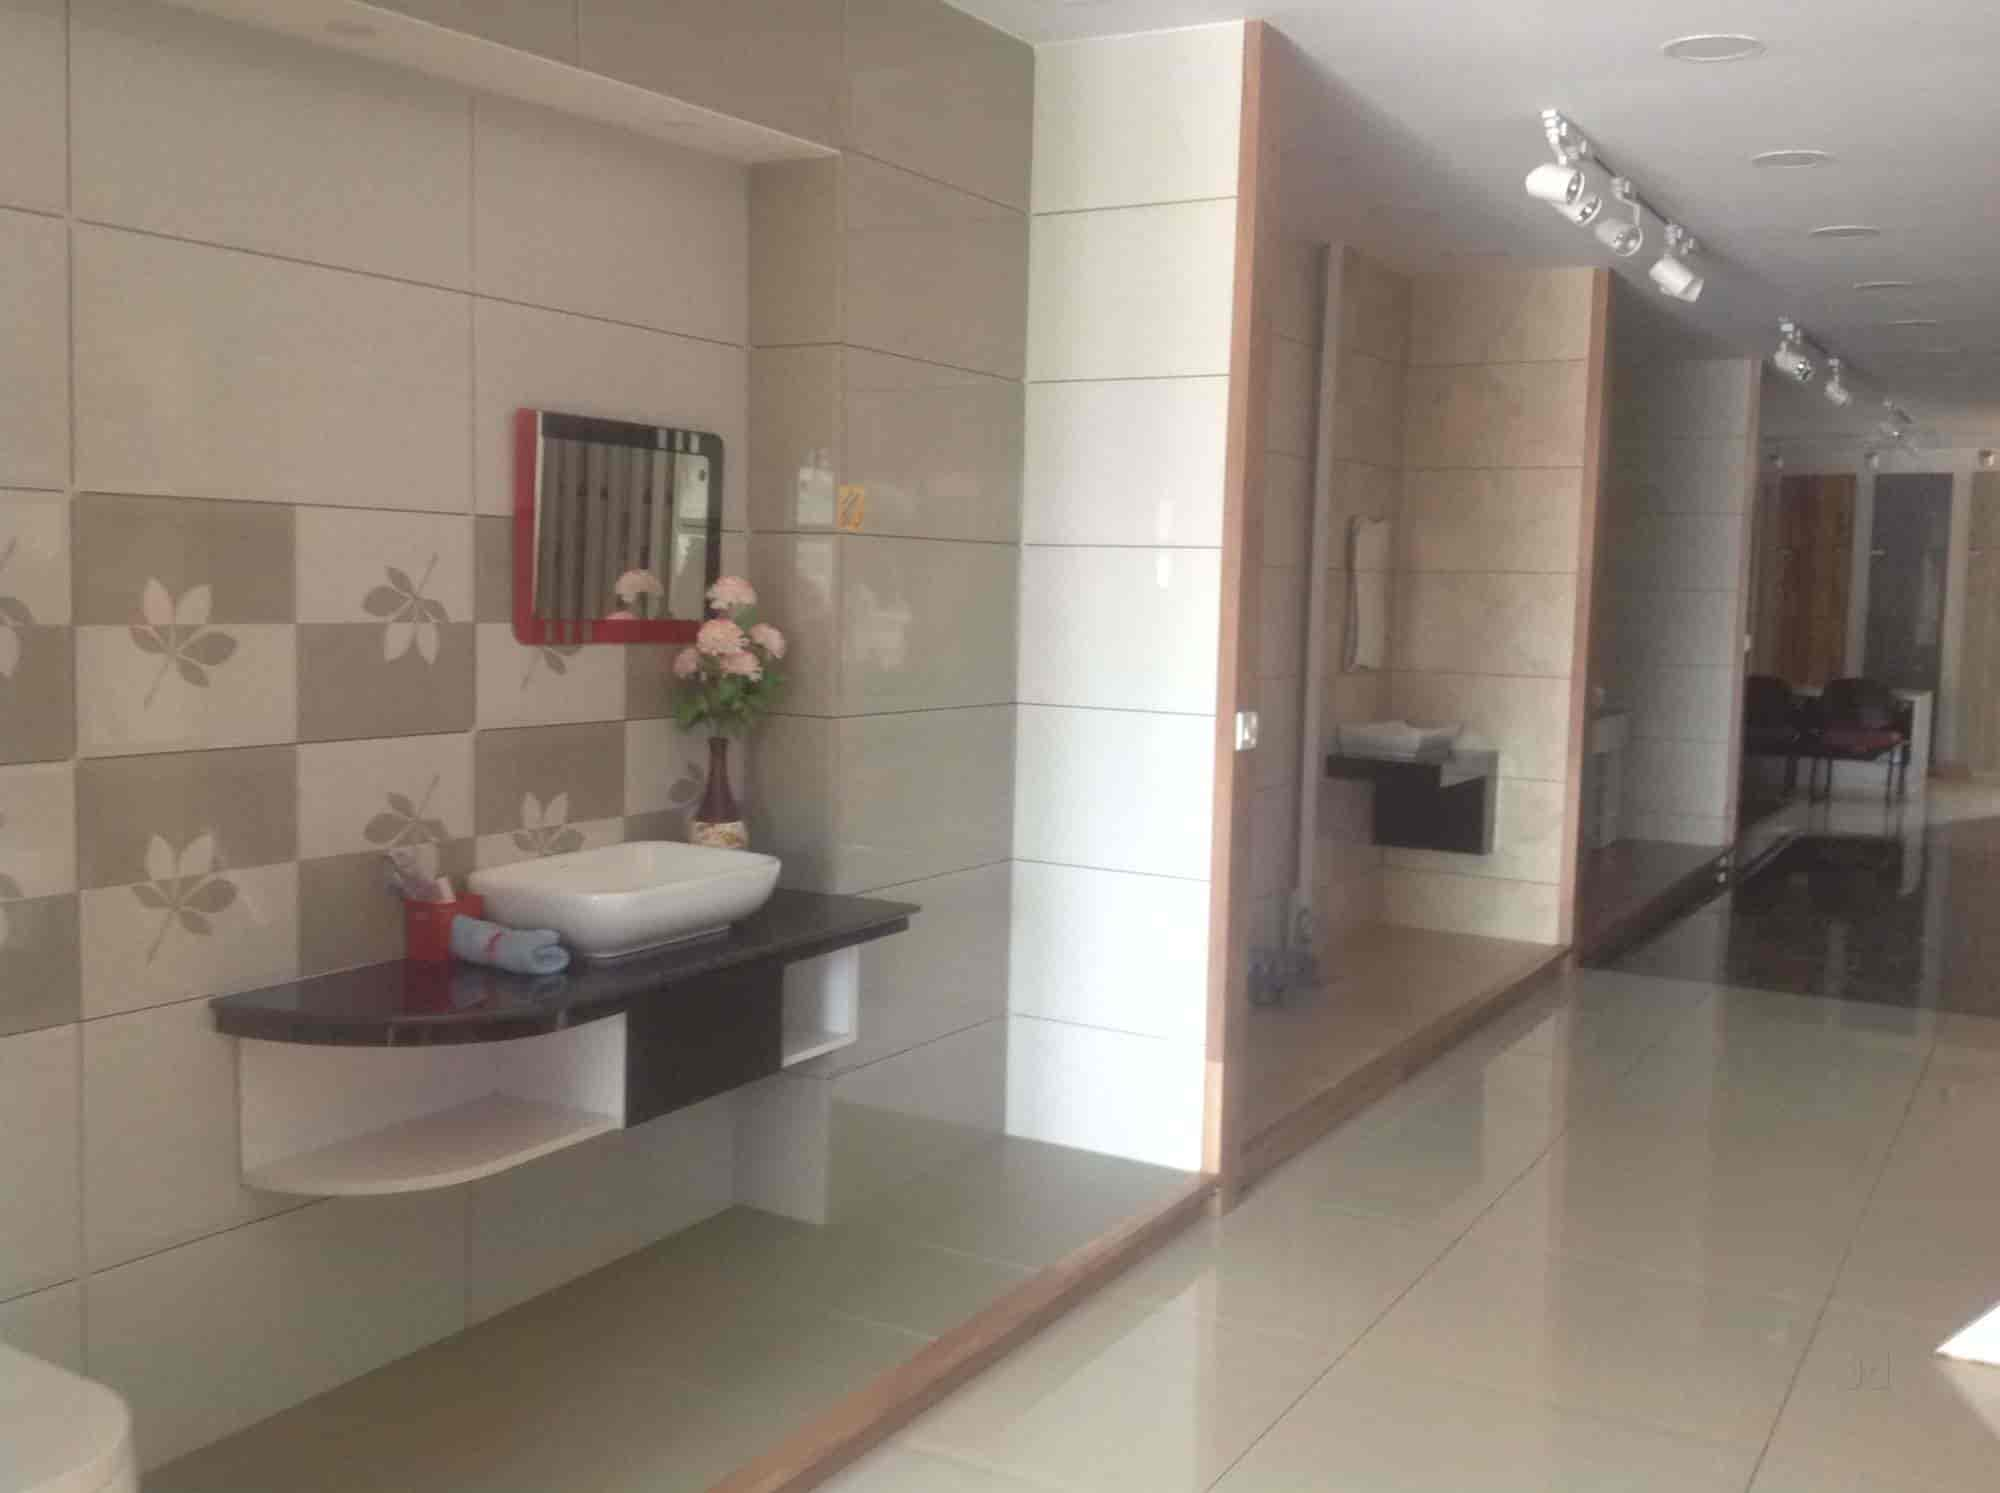 Bathroom Tiles Bangalore spoorthi tiles and ceramics, jp nagar 8th phase, bangalore